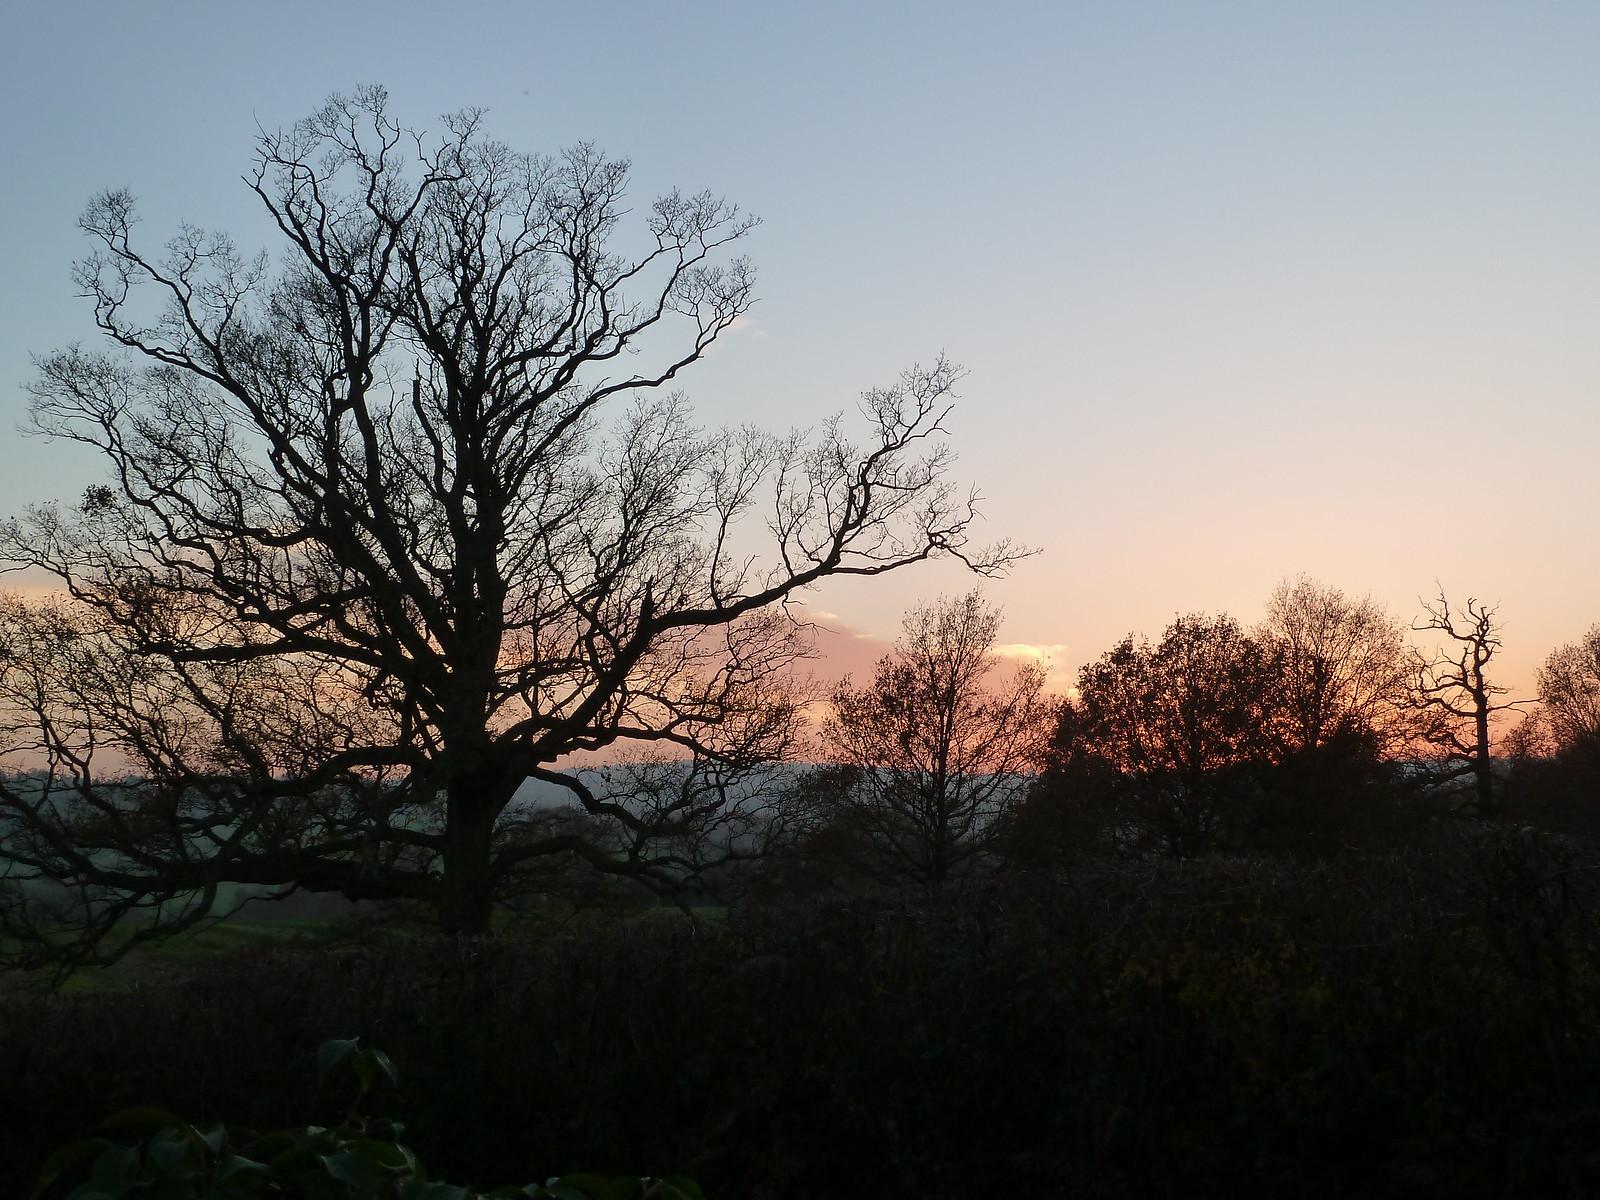 Silhouettes, Autumn Sky (Eridge Circular)